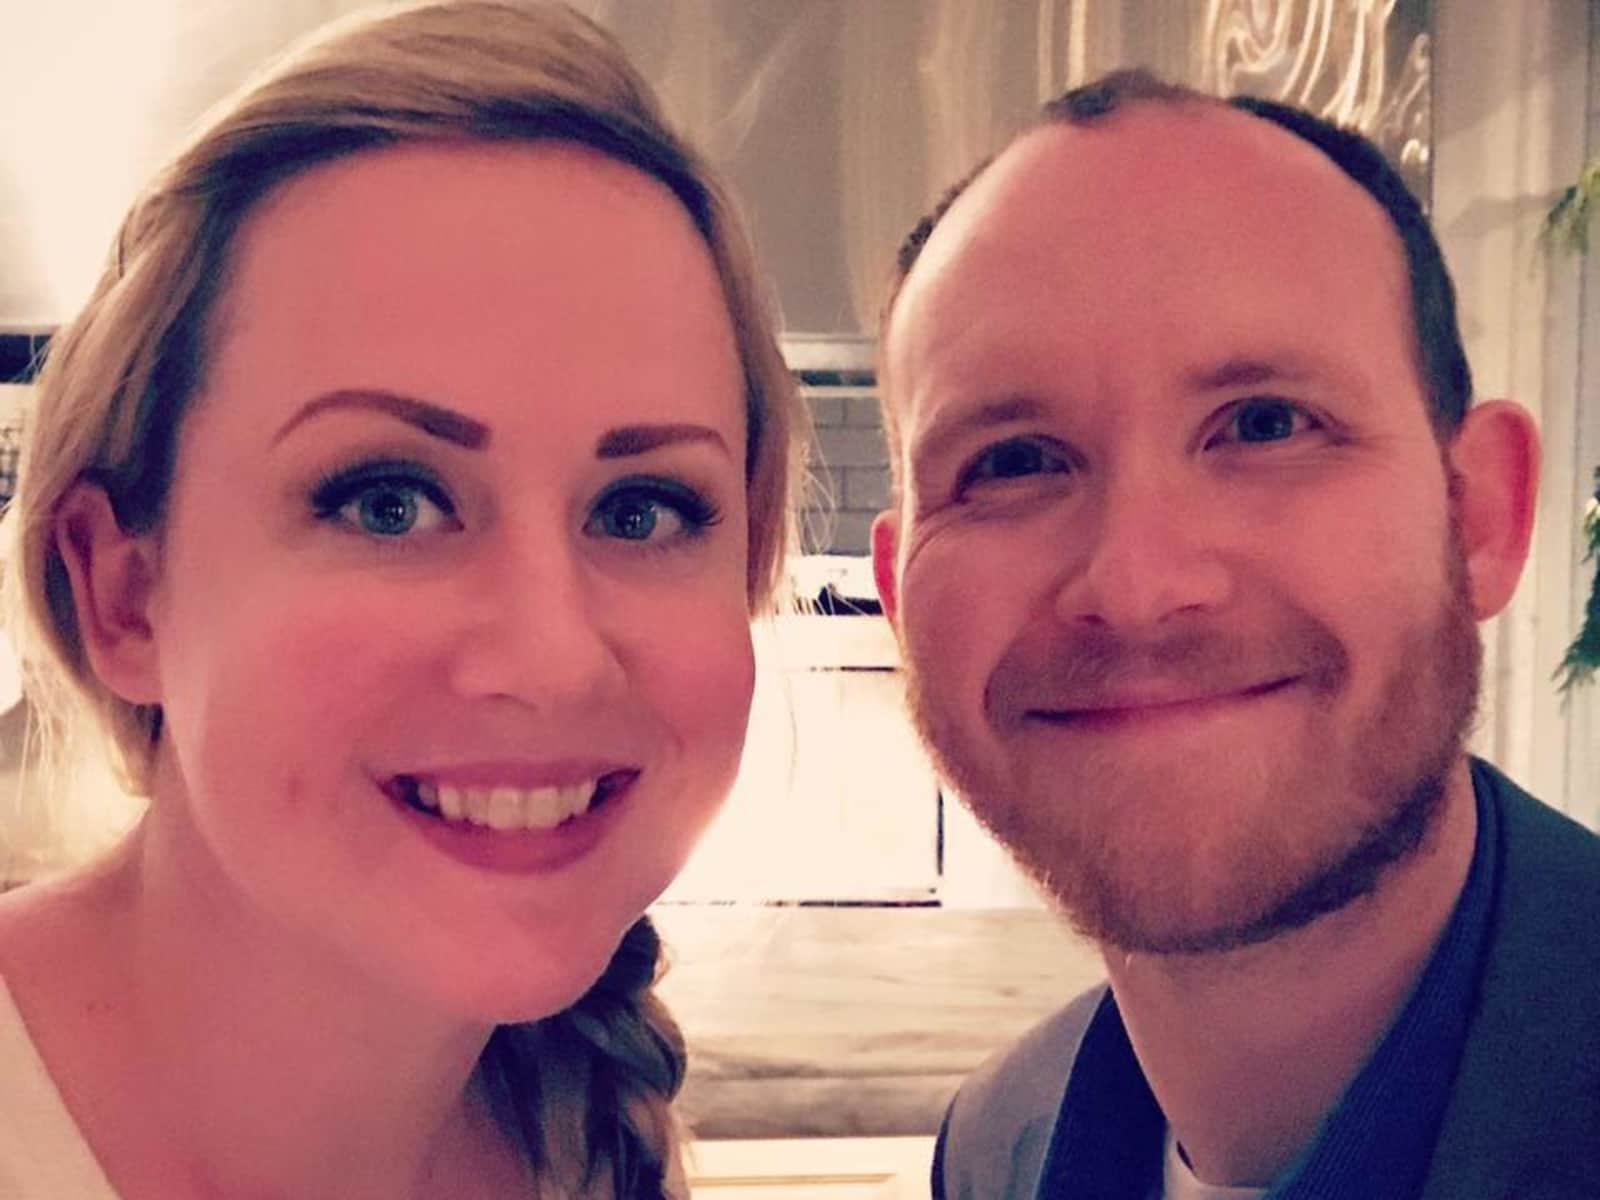 Adrienne & James from Coronado, California, United States